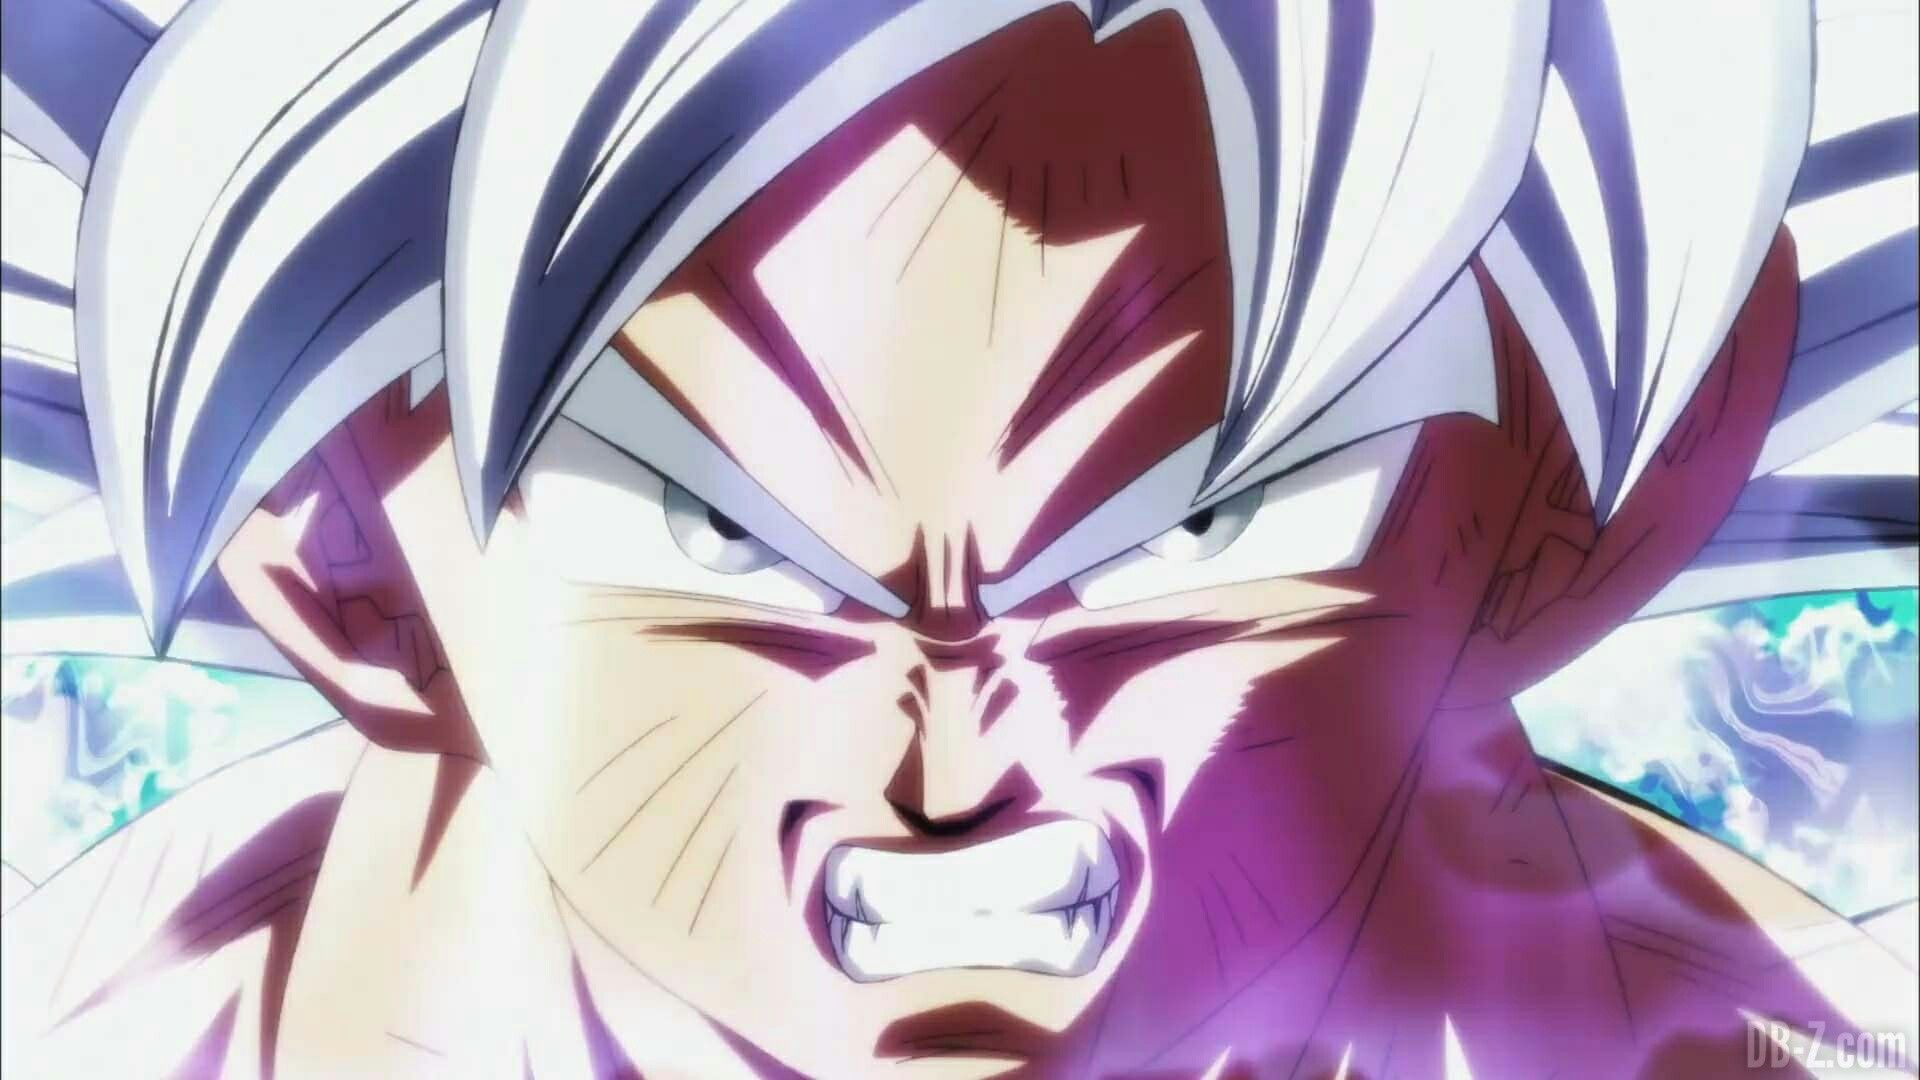 Goku Migatte Kansei Dragon Ball Art Goku Goku Dragon Ball Art